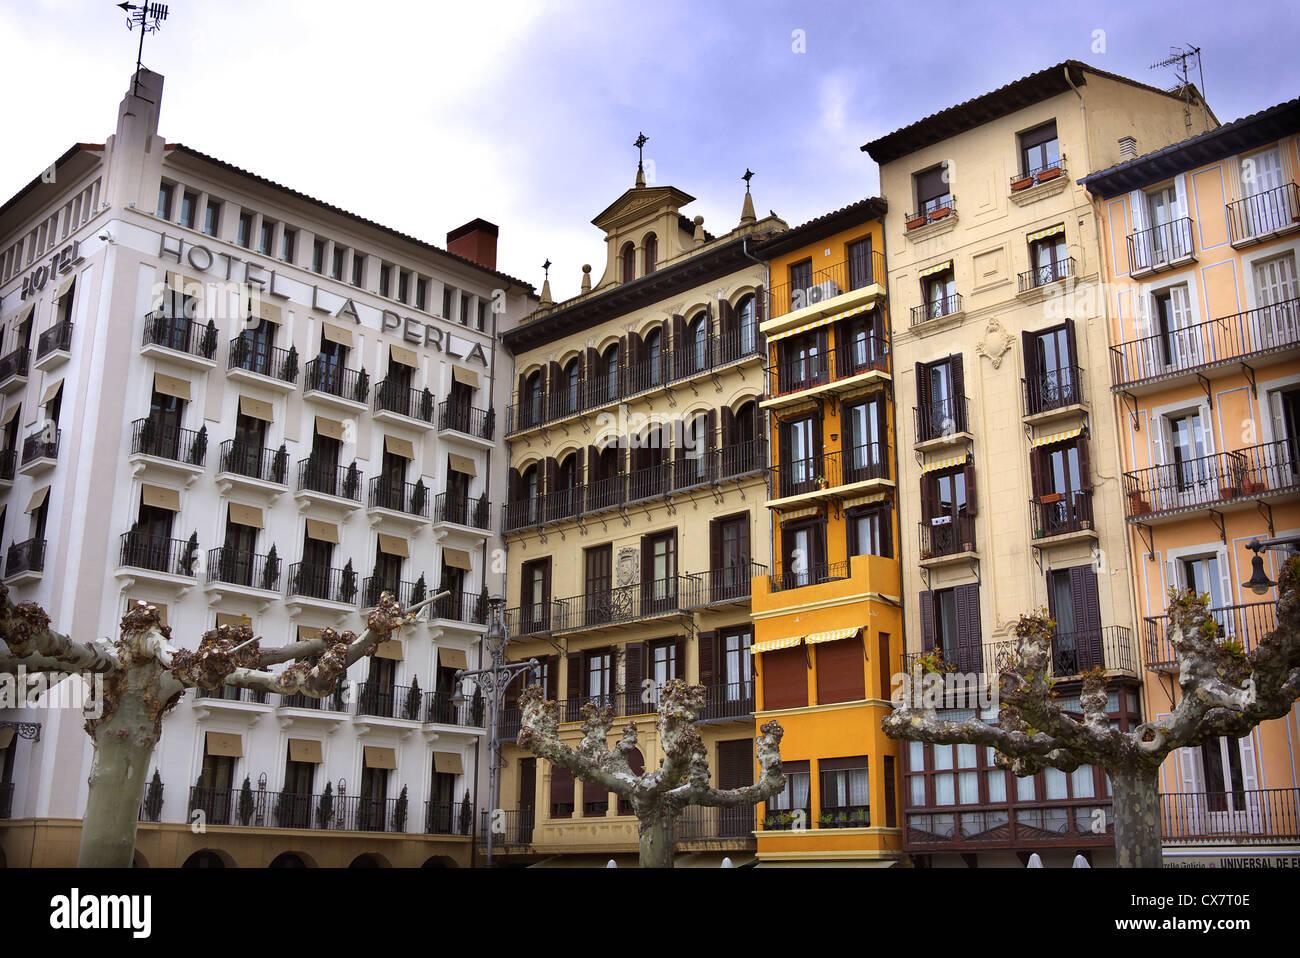 Hotel La Perla on Plaza del Castillo in Pamplona, Spain. Stock Photo